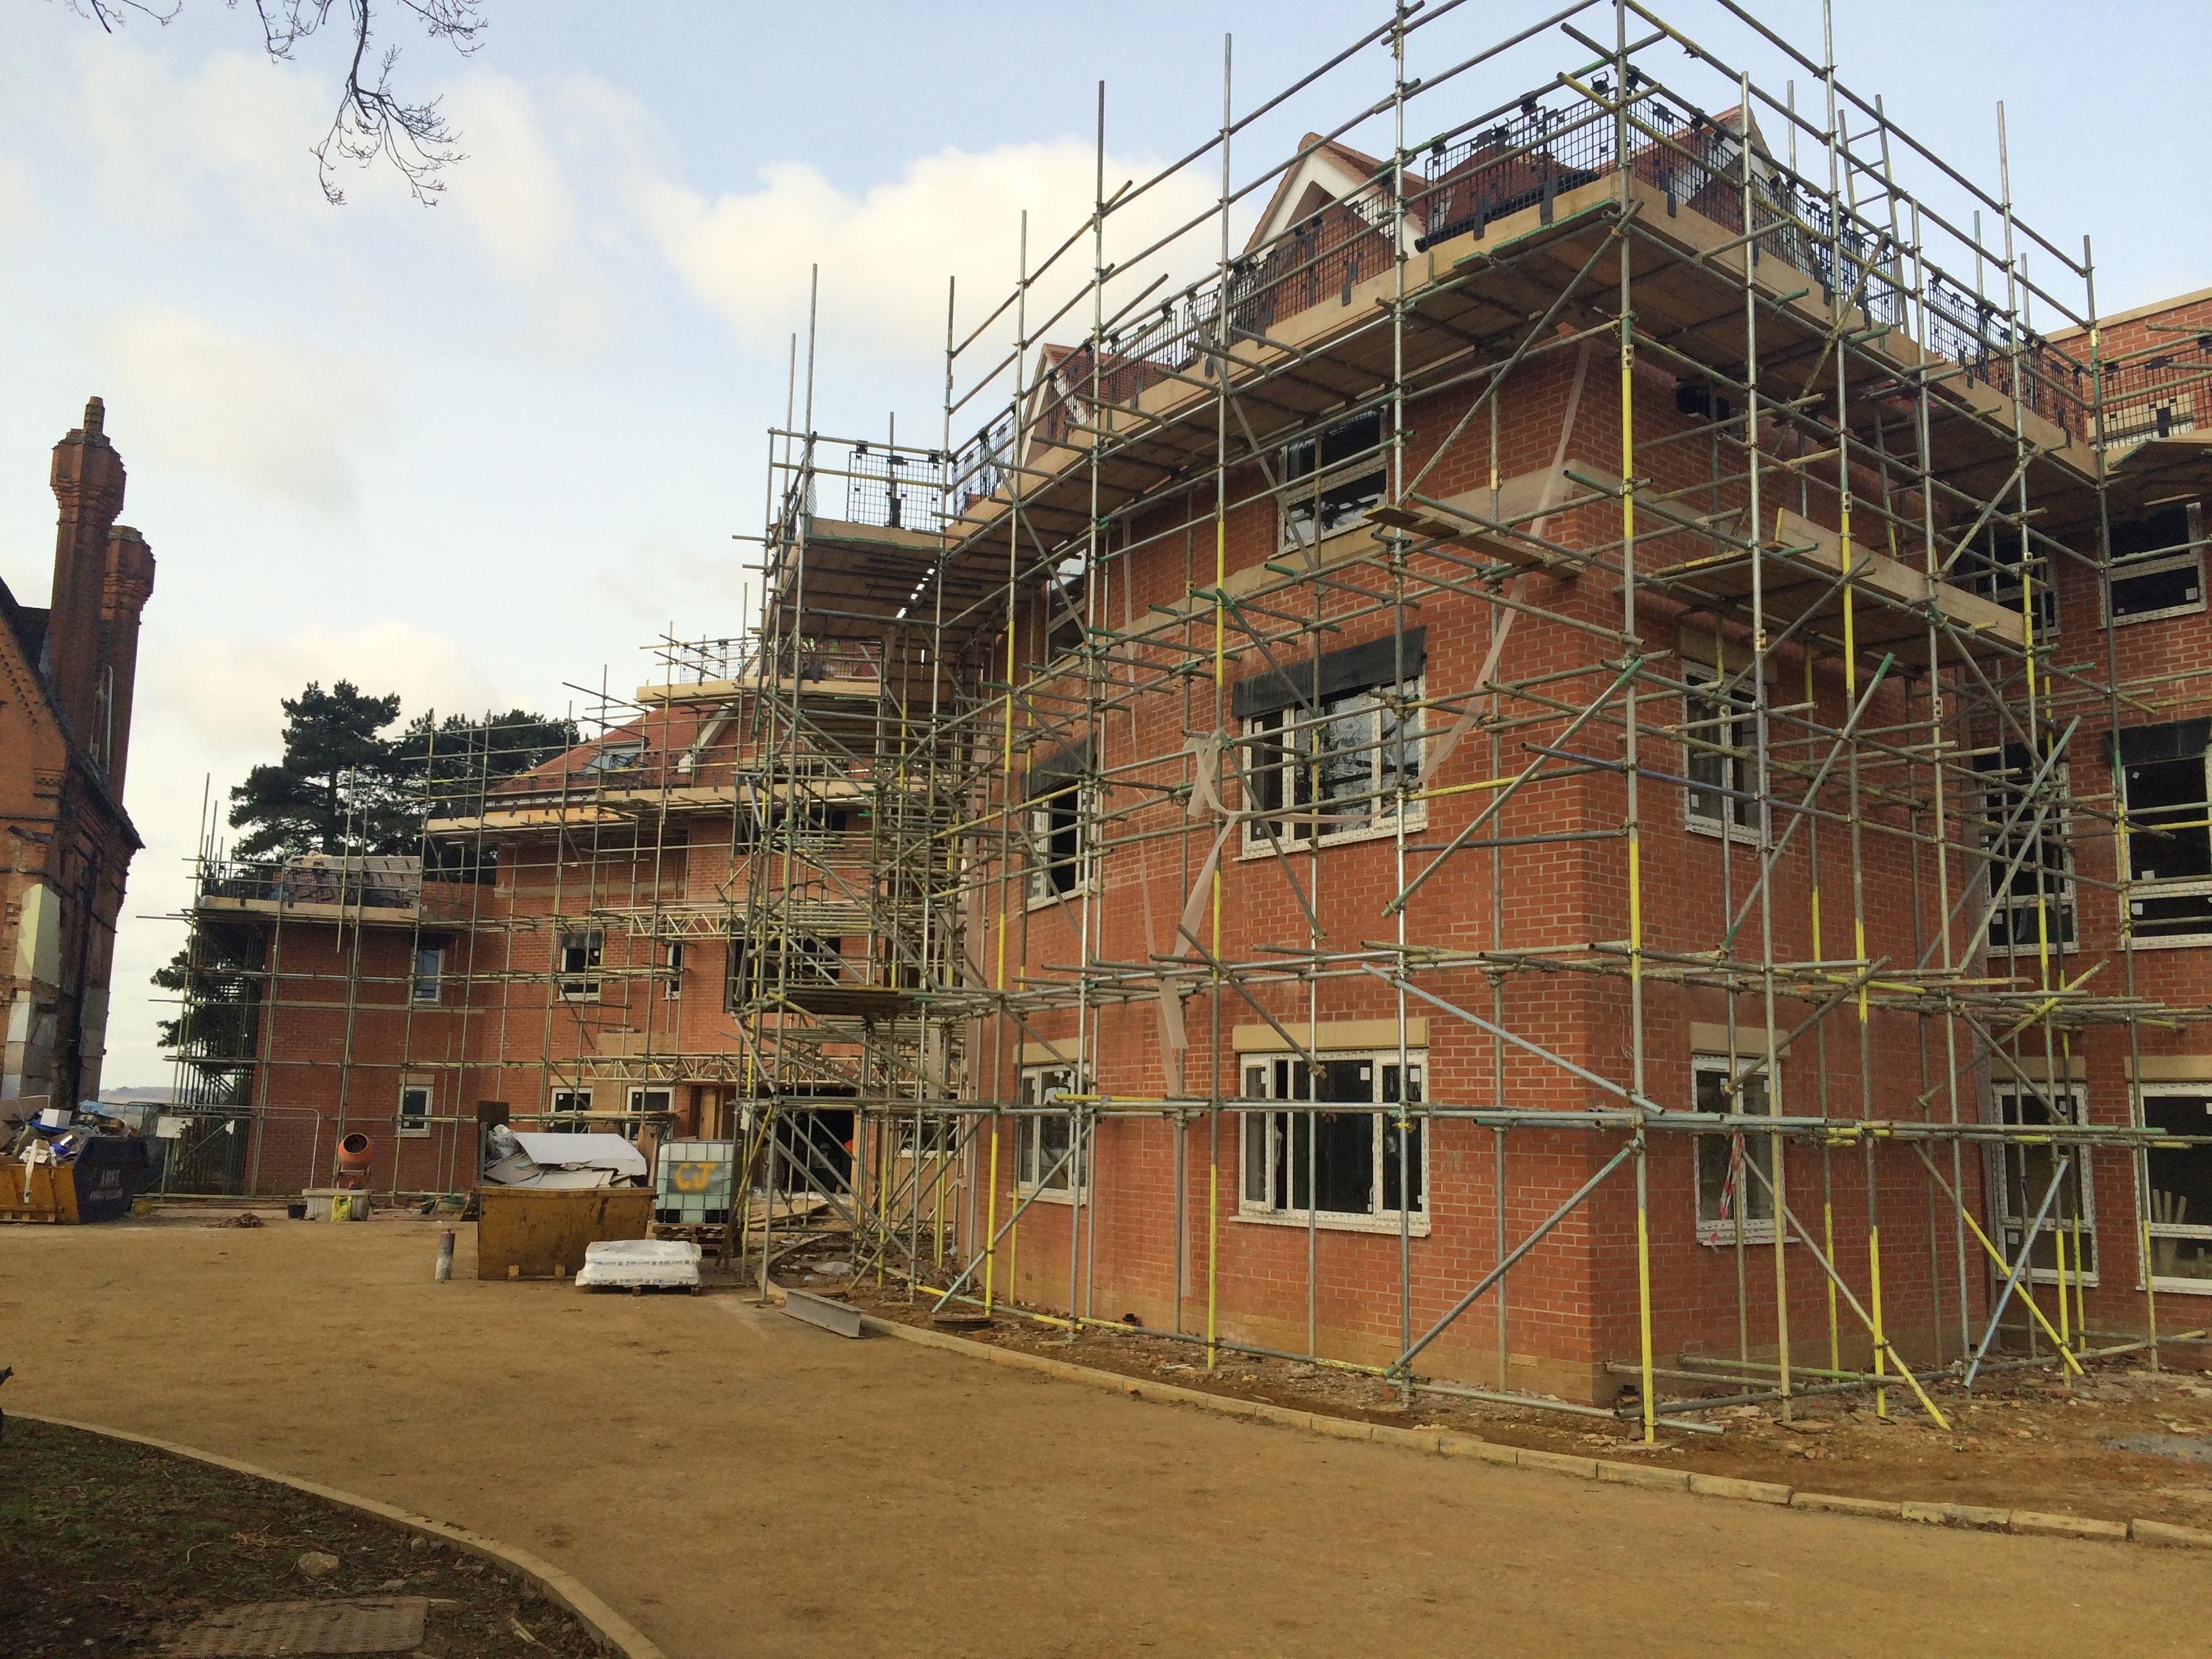 J N A Surveyors (Chartered Building Surveyors) - Aylesbury, Buckinghamshire HP19 8SG - 01296 337874 | ShowMeLocal.com